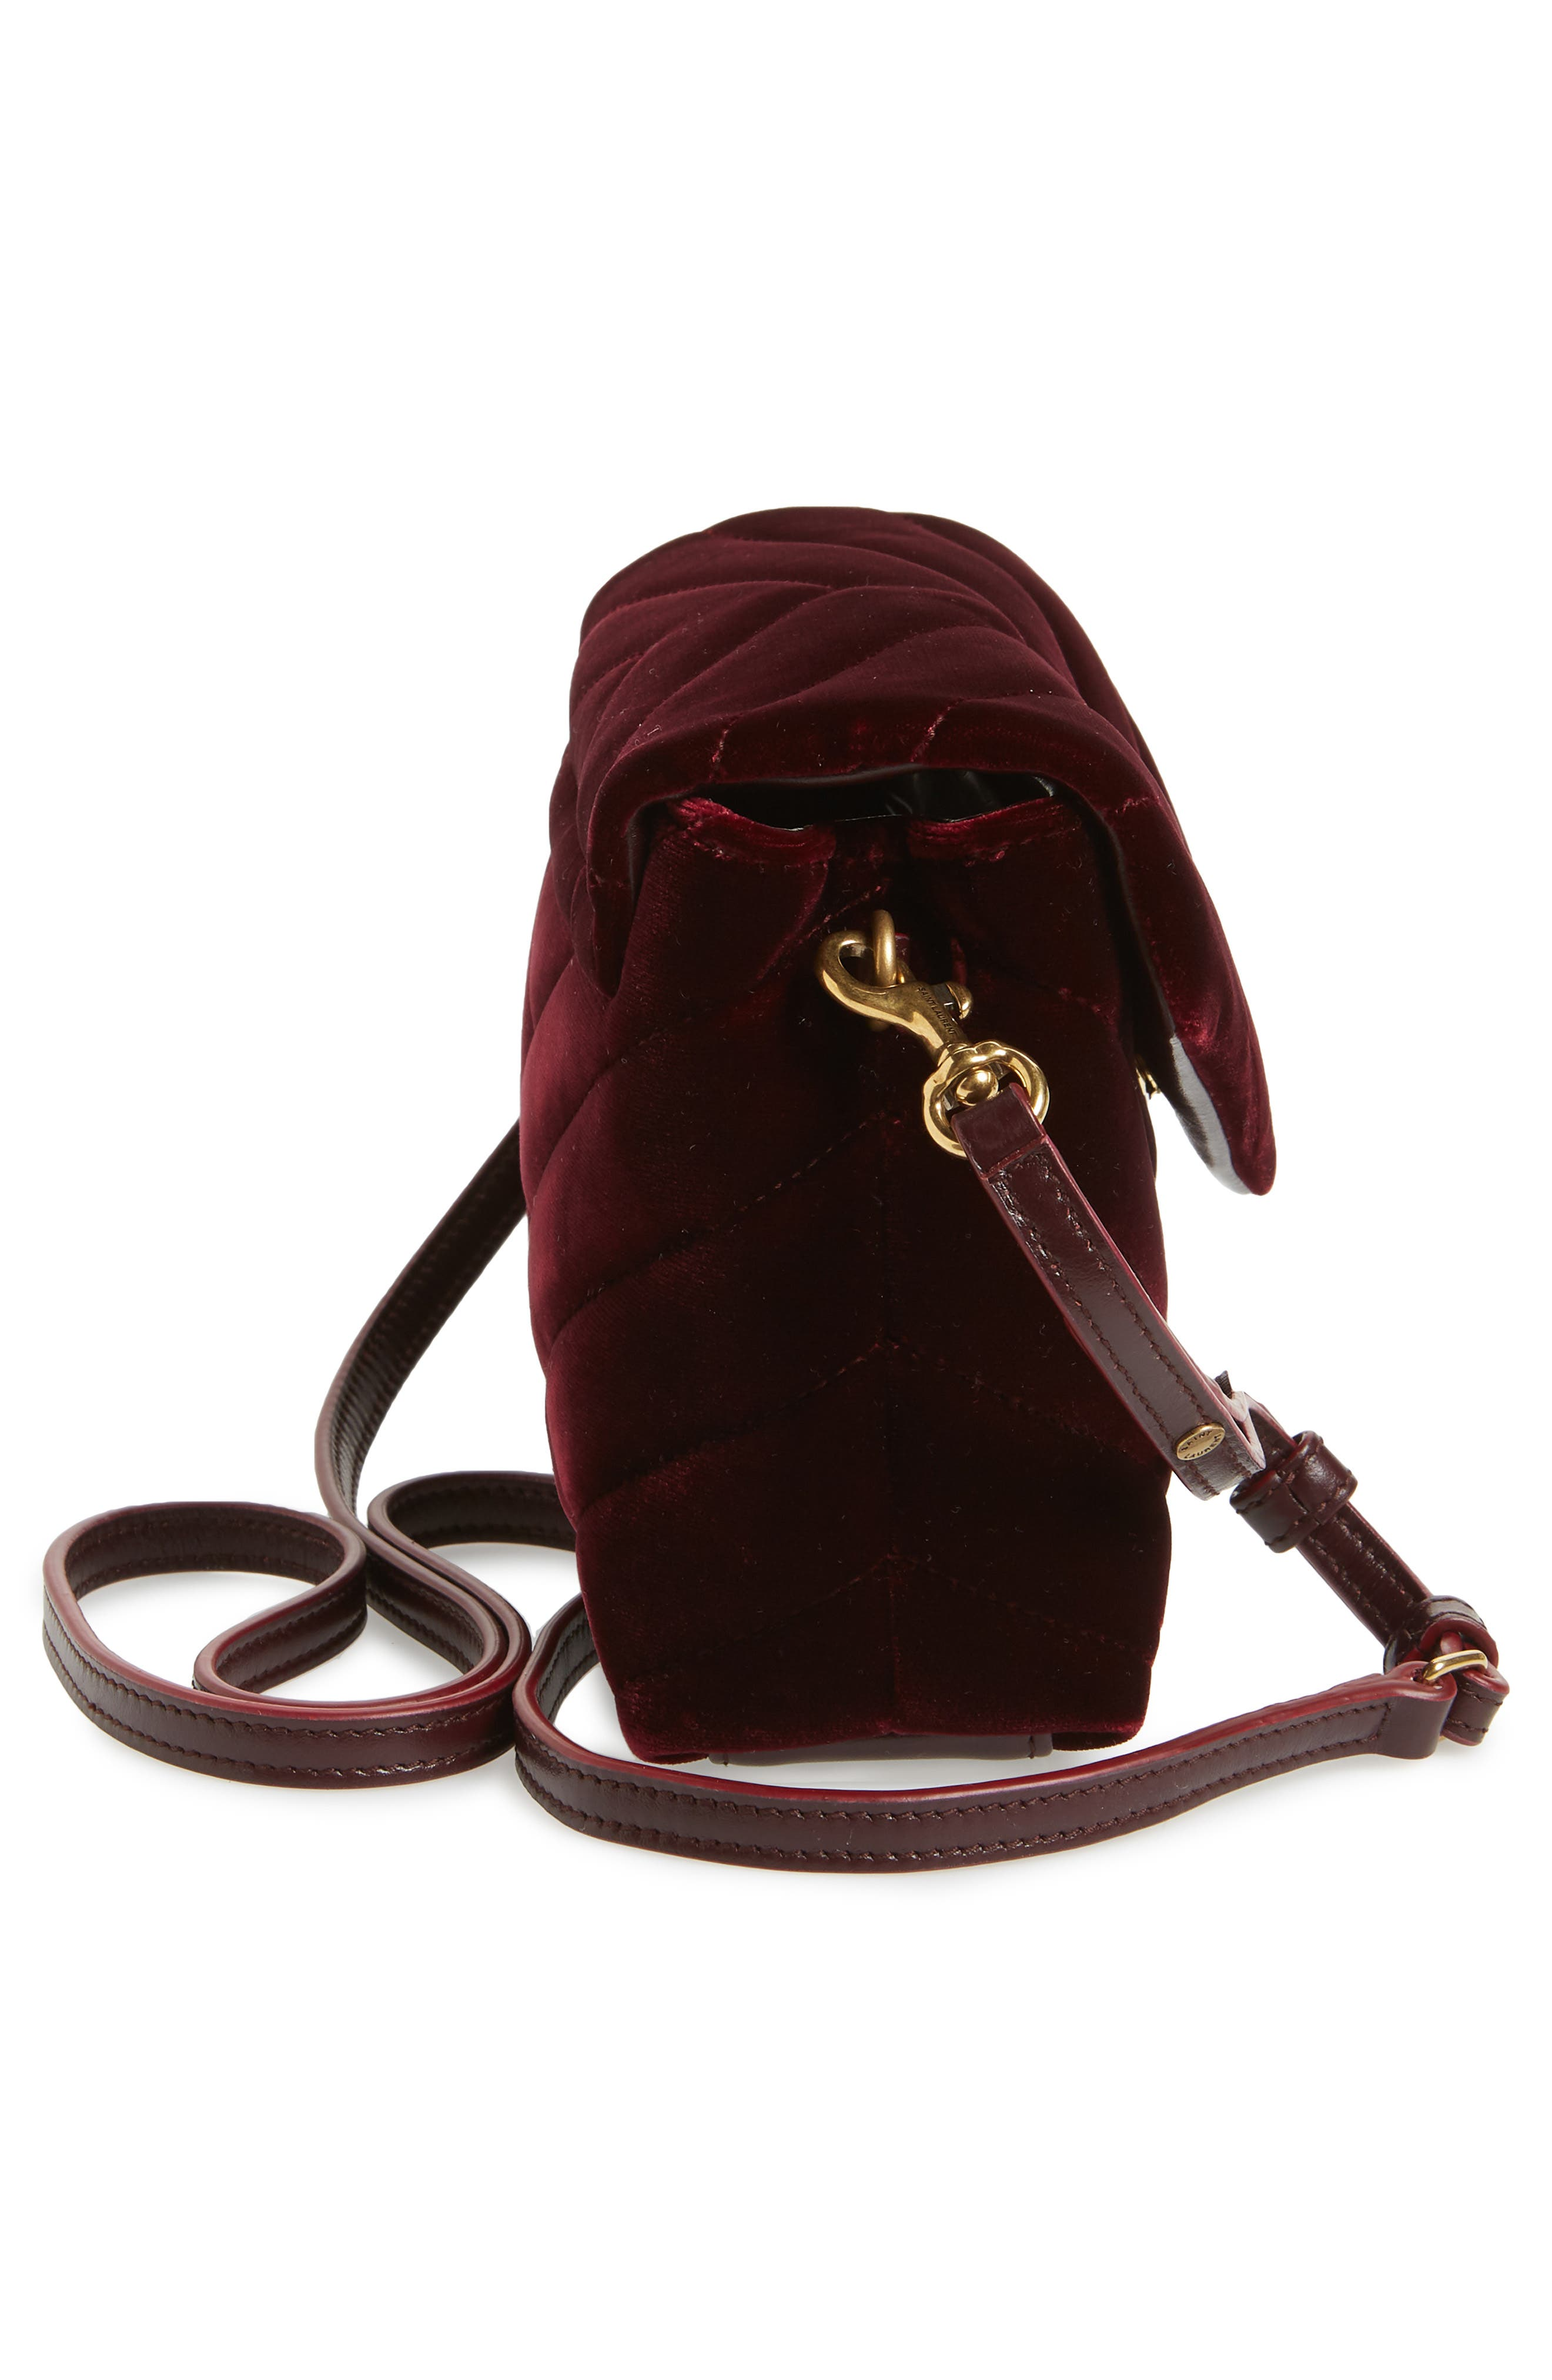 SAINT LAURENT,                             Toy Loulou Velvet Crossbody Bag,                             Alternate thumbnail 5, color,                             930